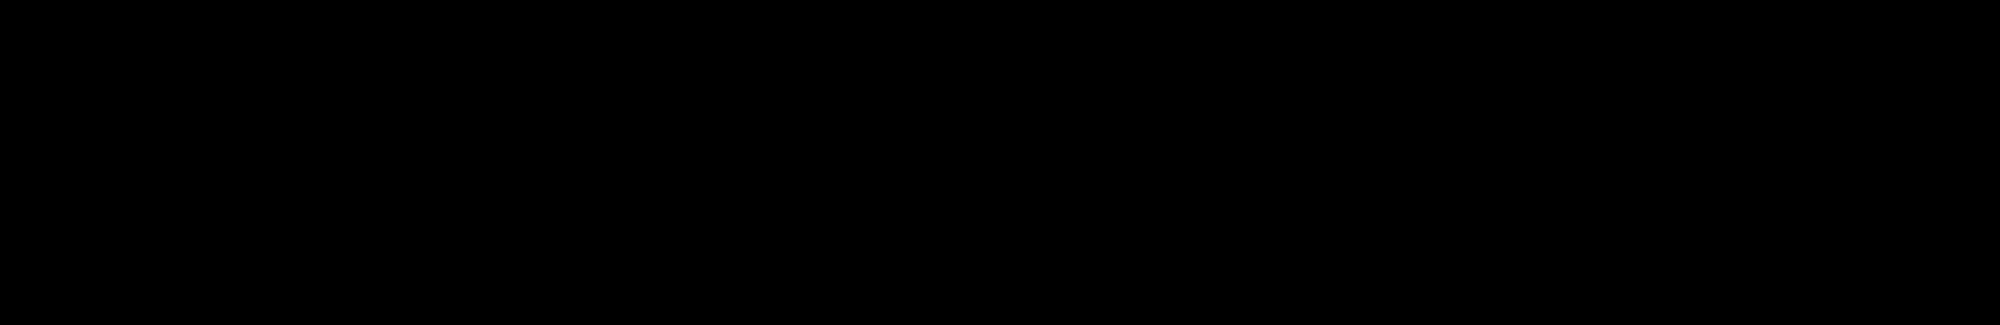 Chobani logo clipart clip art royalty free download Chobani | Qualtrics clip art royalty free download